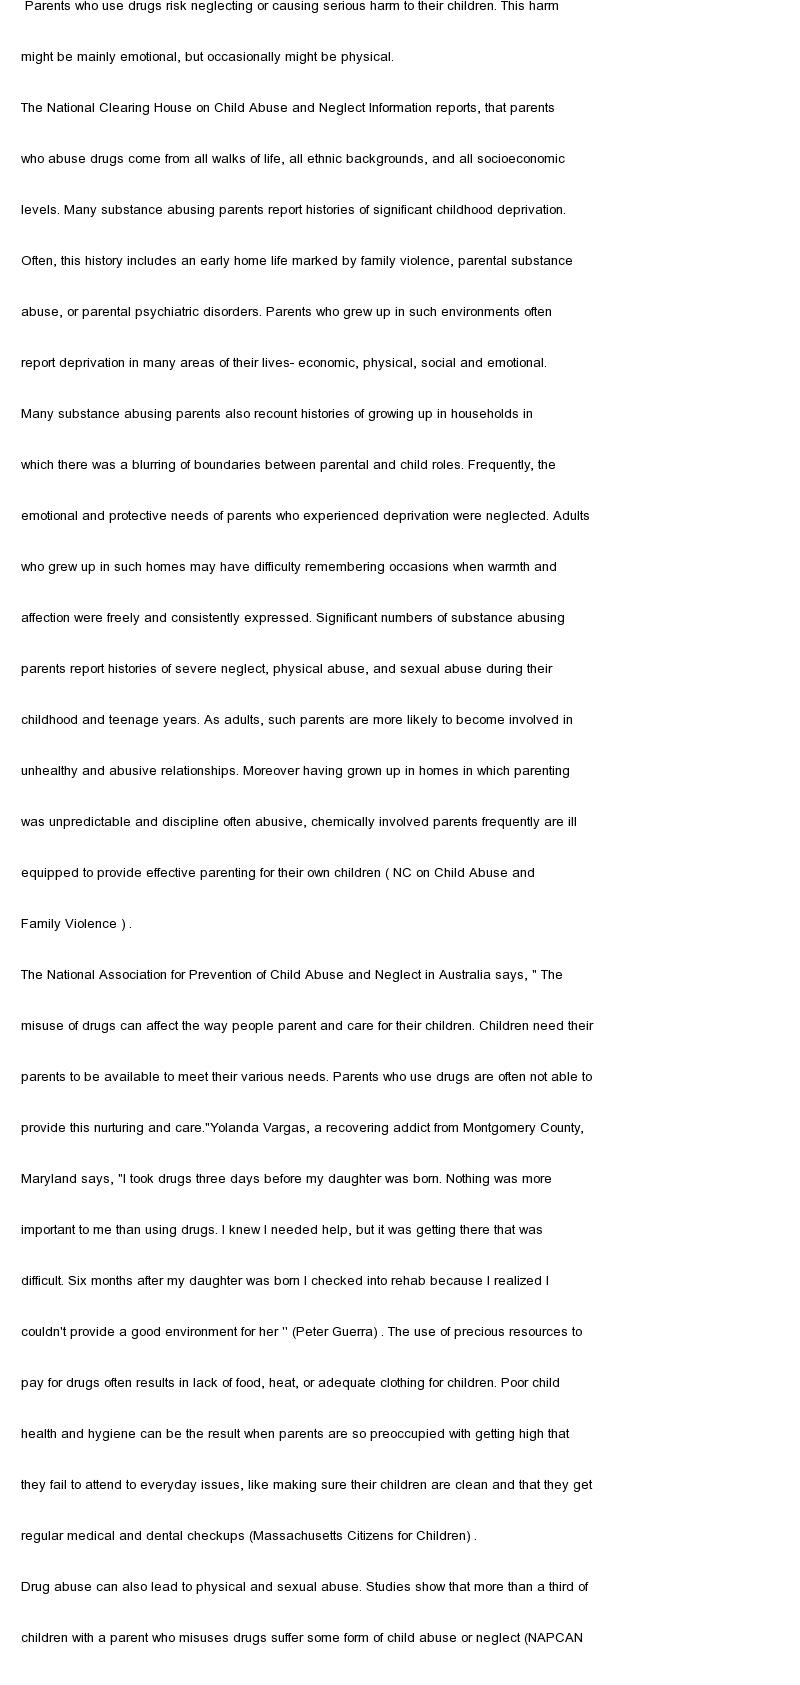 Video Games Cause Behaviour Problems Media Essay ... Video games ...